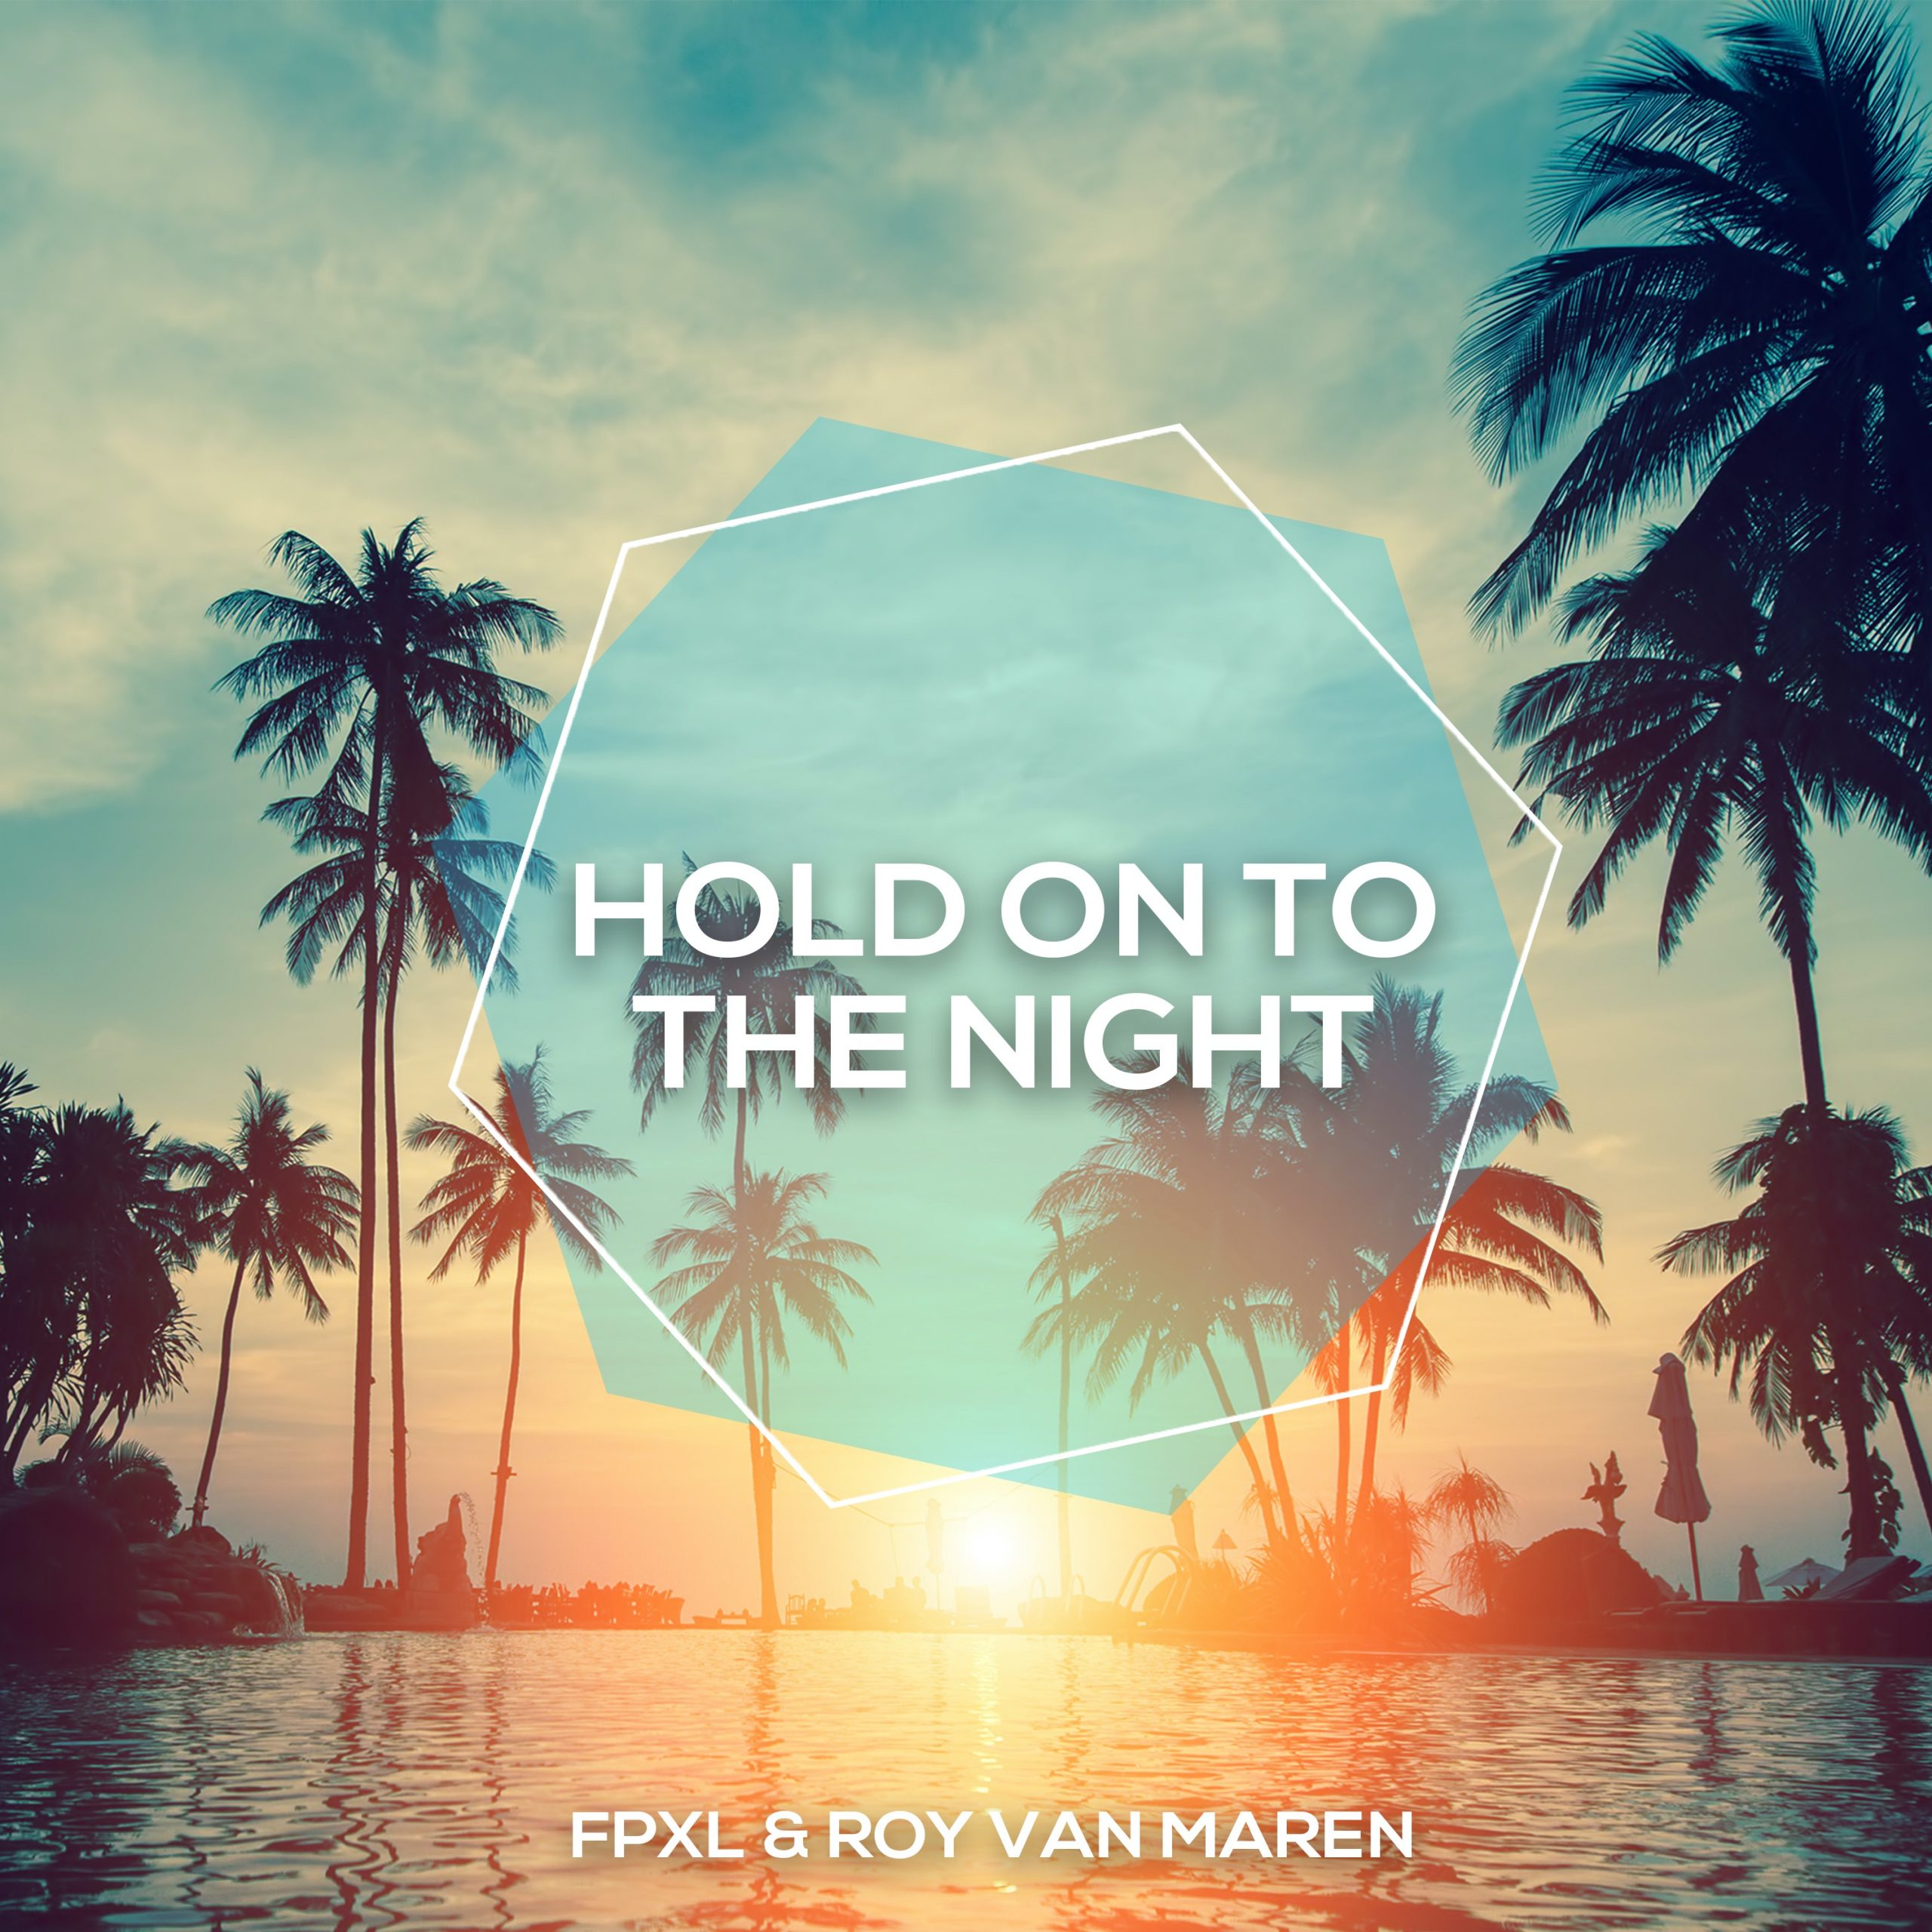 FPXL & Roy van Maren – Hold On To The Night